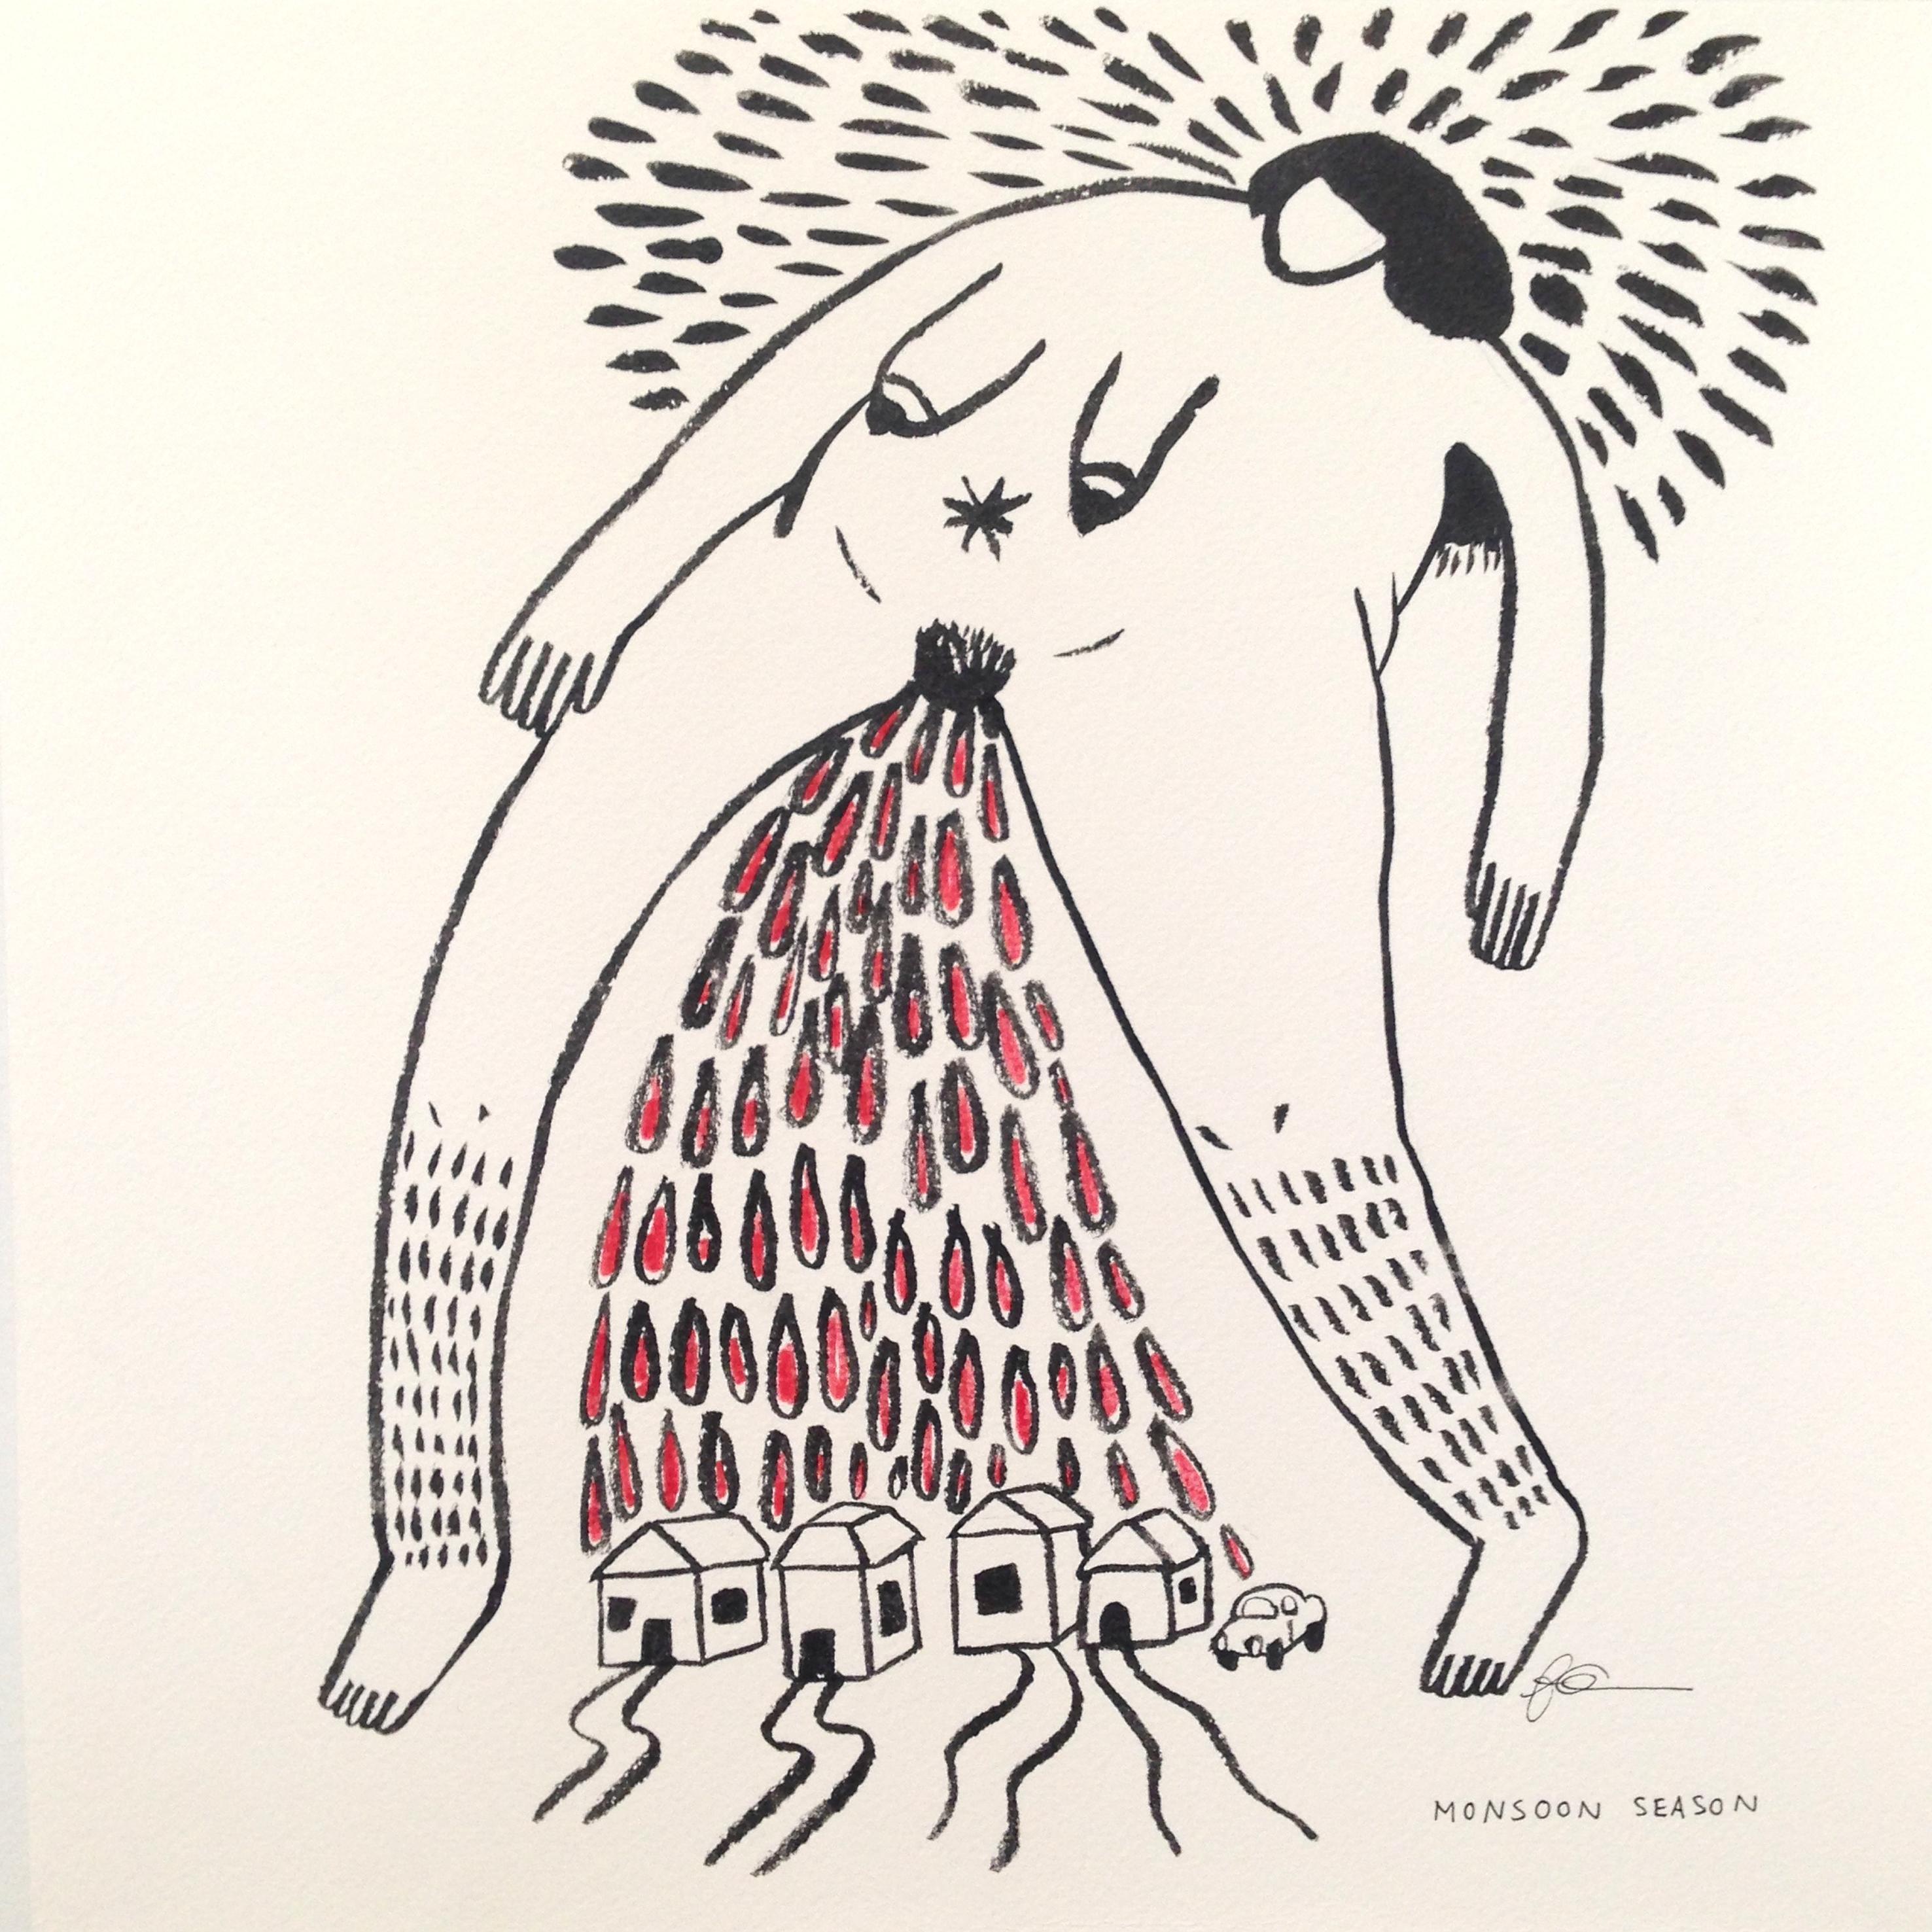 2953x2953 Australian Art Exhibition Challenges The Taboo Of Menstruation